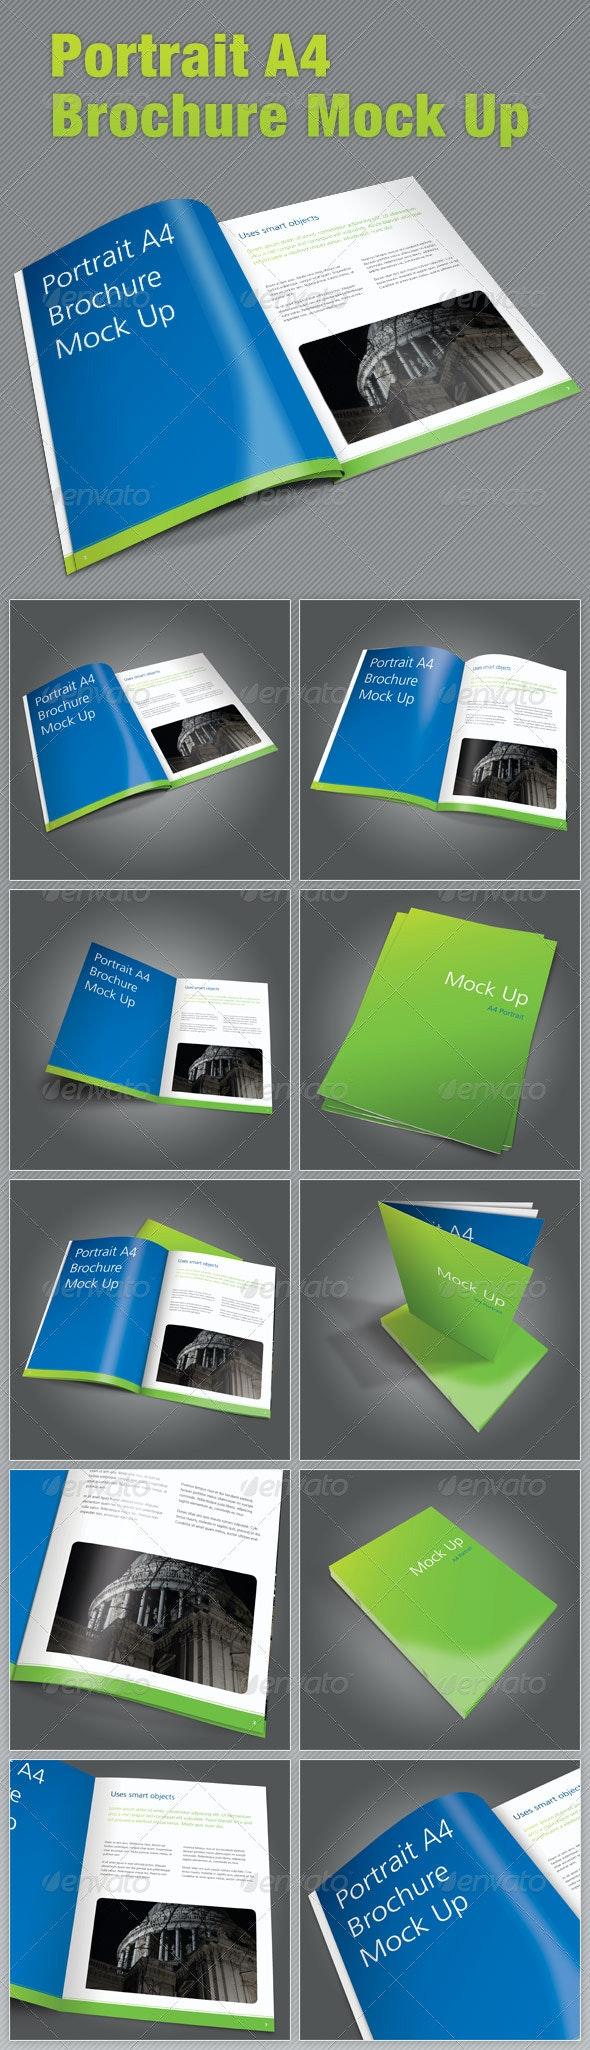 A4 Portrait Brochure Mock Up - Brochures Print